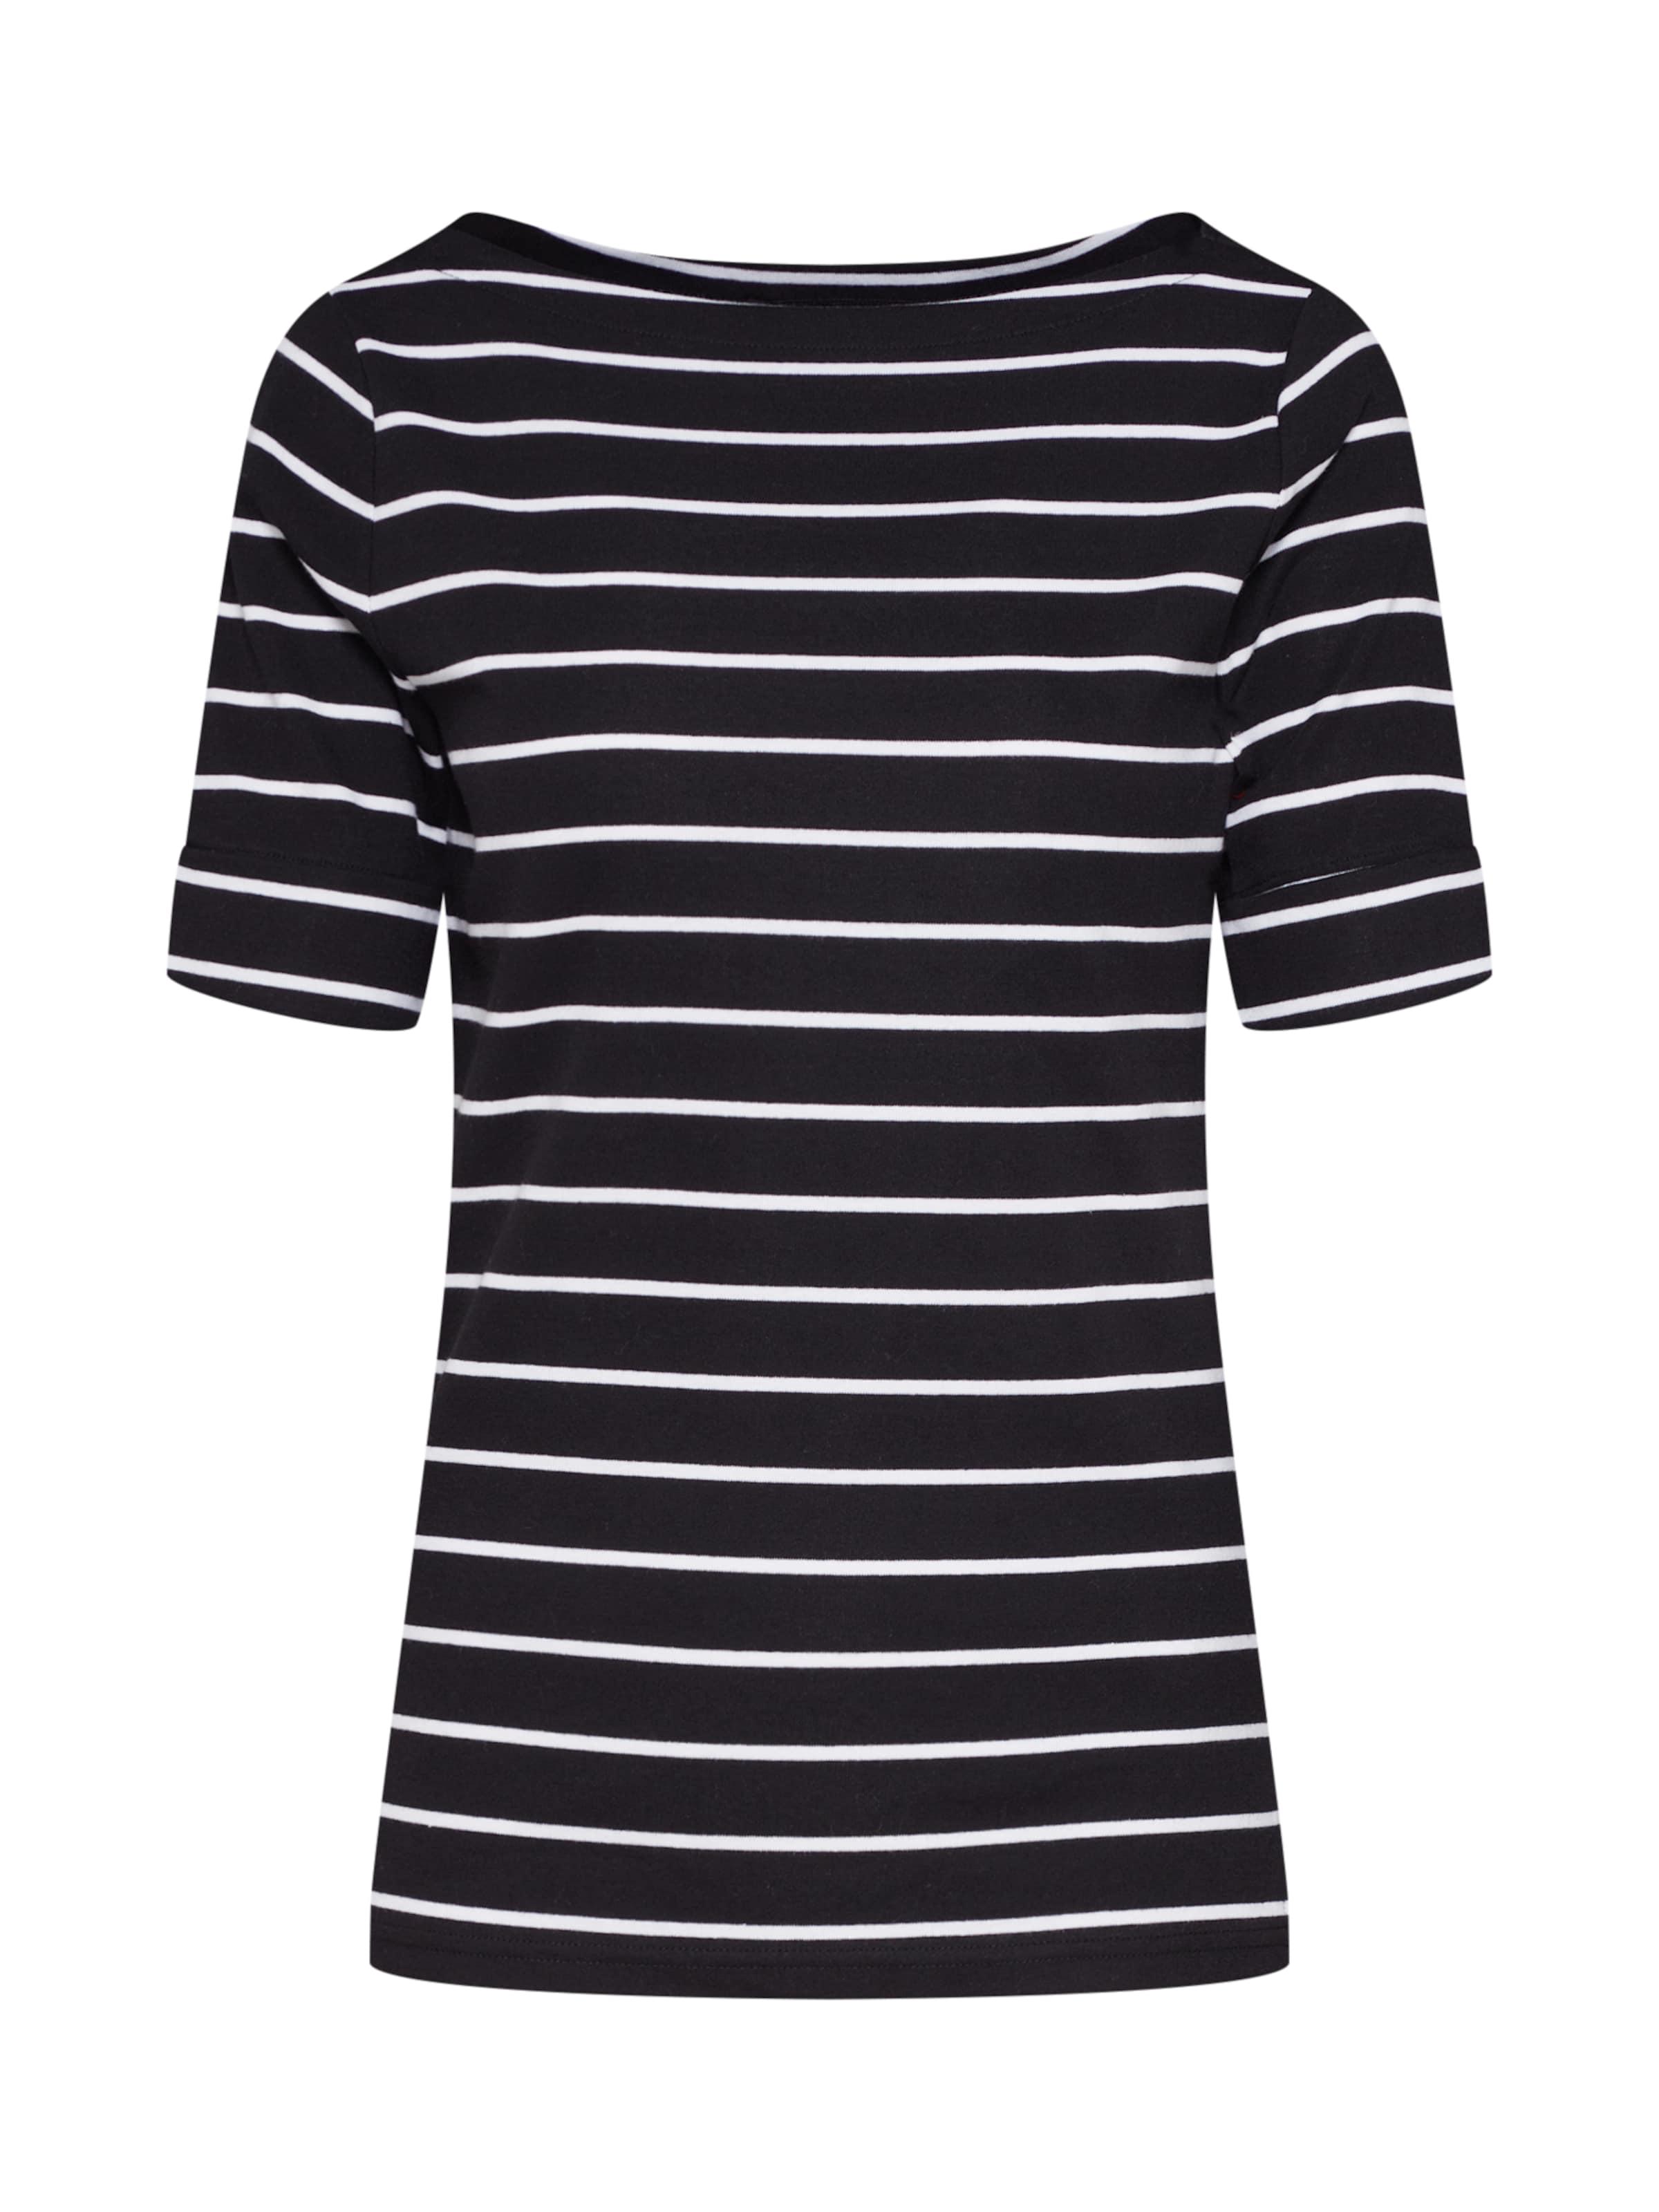 Ralph 'judy' NoirBlanc En Lauren shirt T LVzGUpqSM